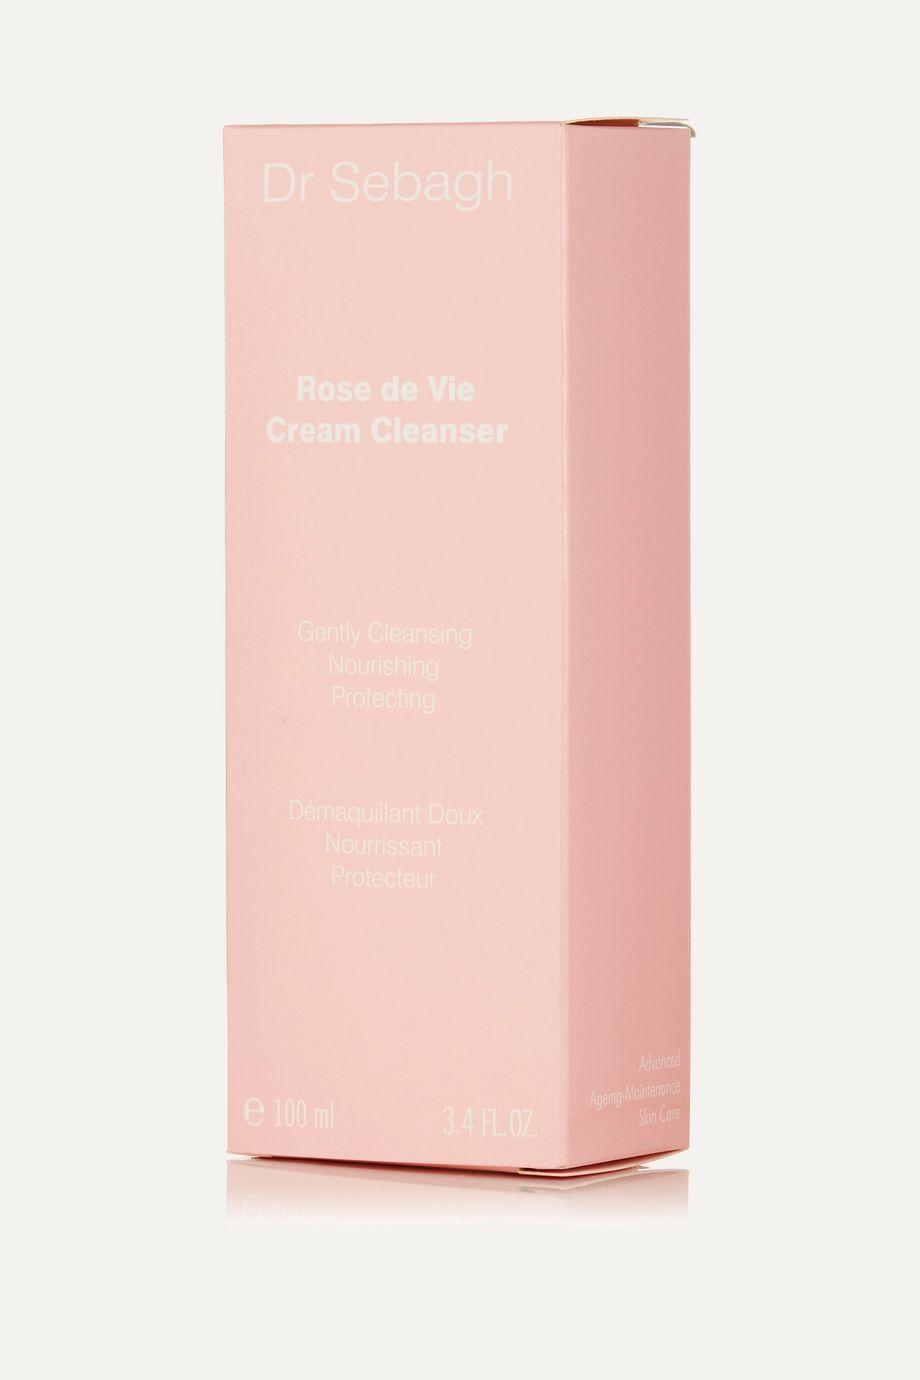 Dr Sebagh Rose de Vie Cream Cleanser, 100 ml – Reinigungsmilch